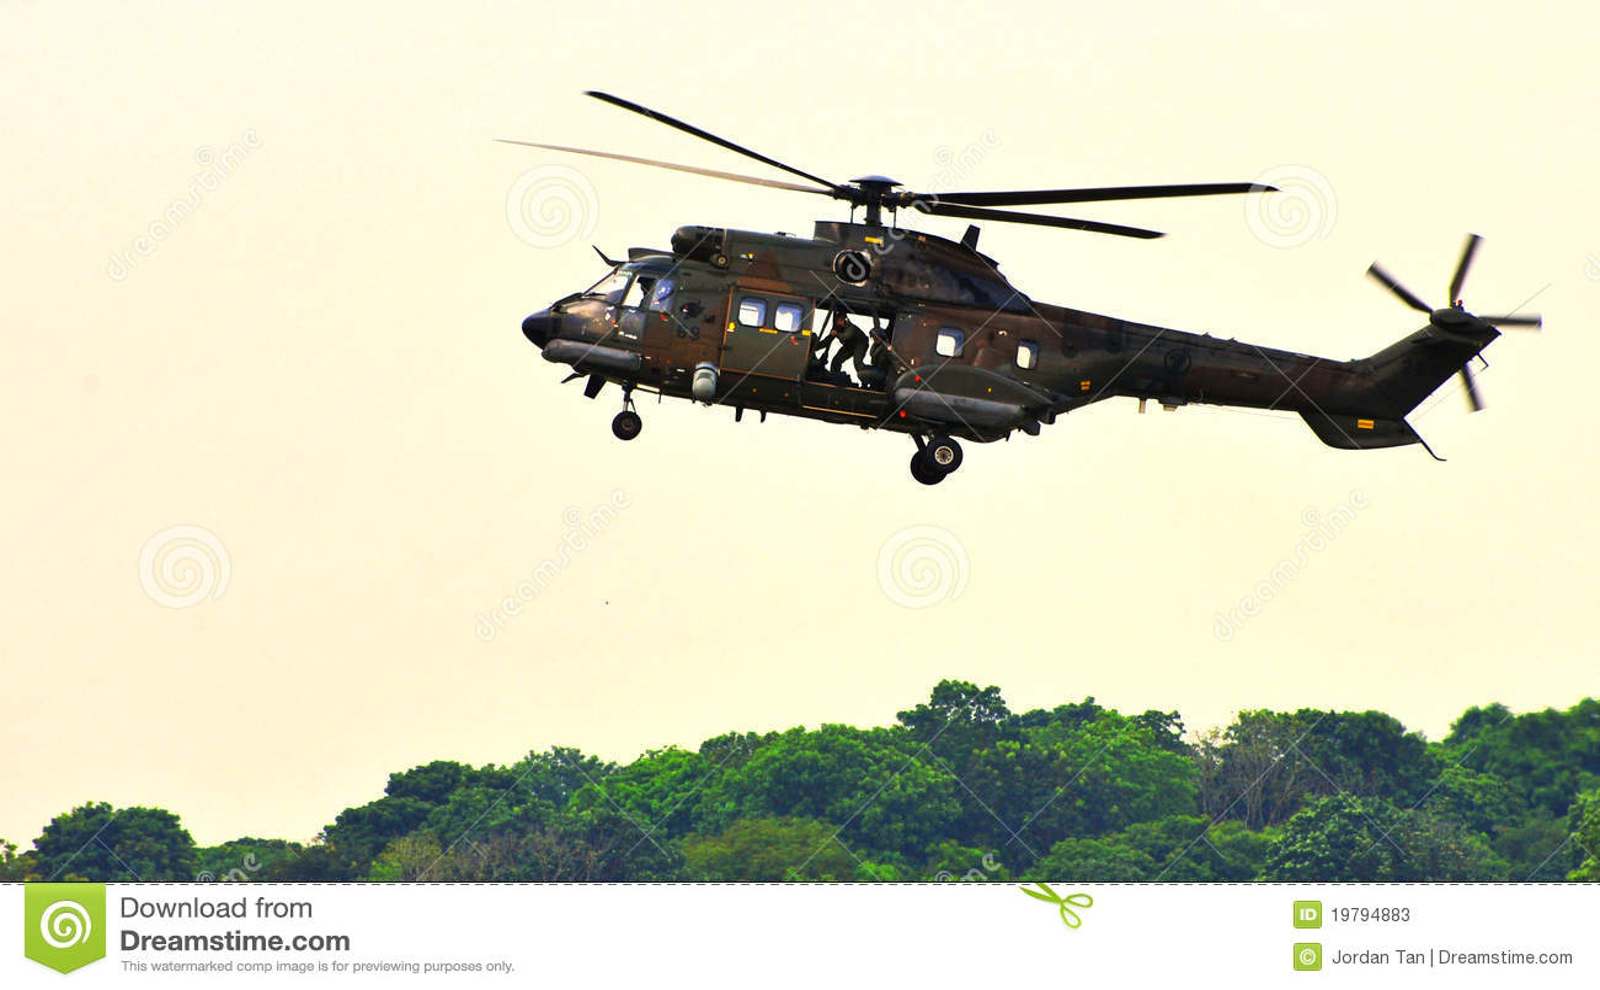 För helikopterpuma för airfield supernärmande sig rsaf